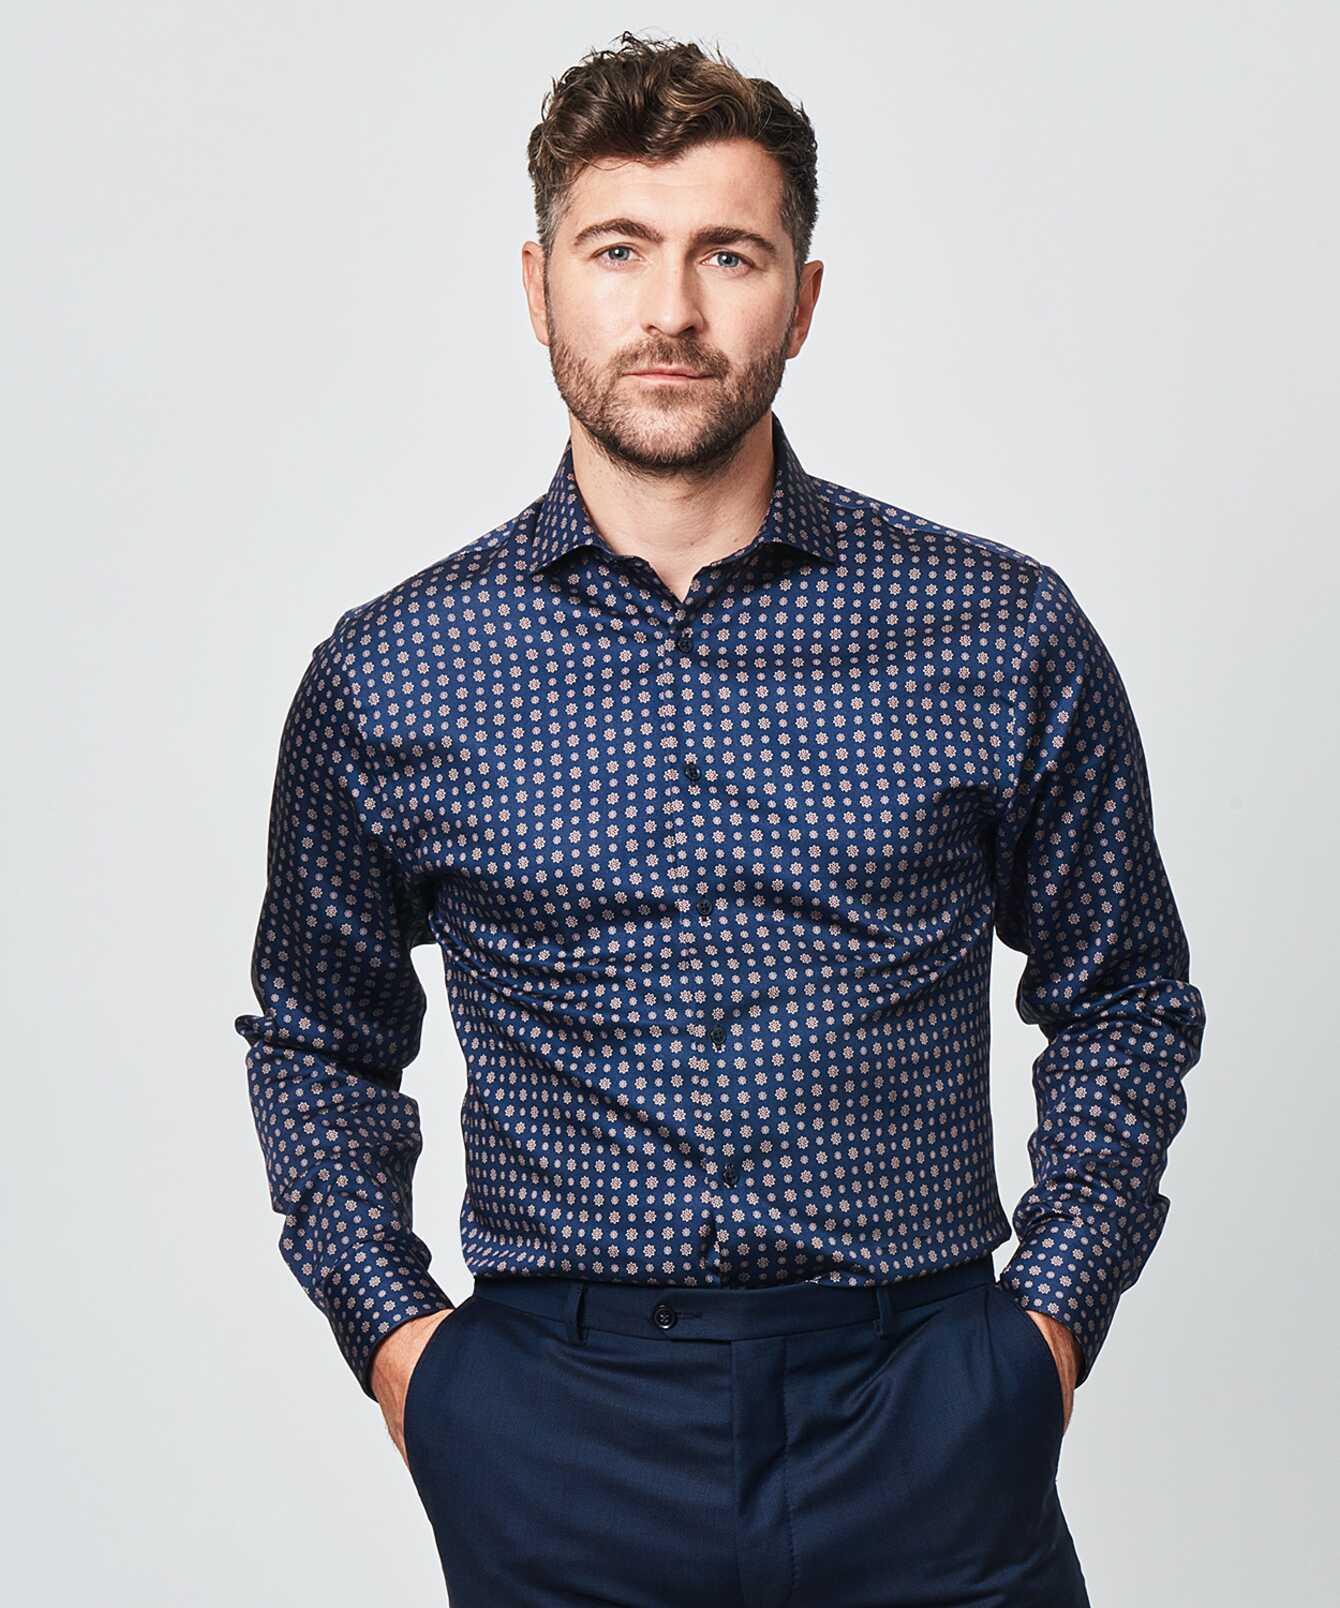 Skjorta Vestone The Shirt Factory